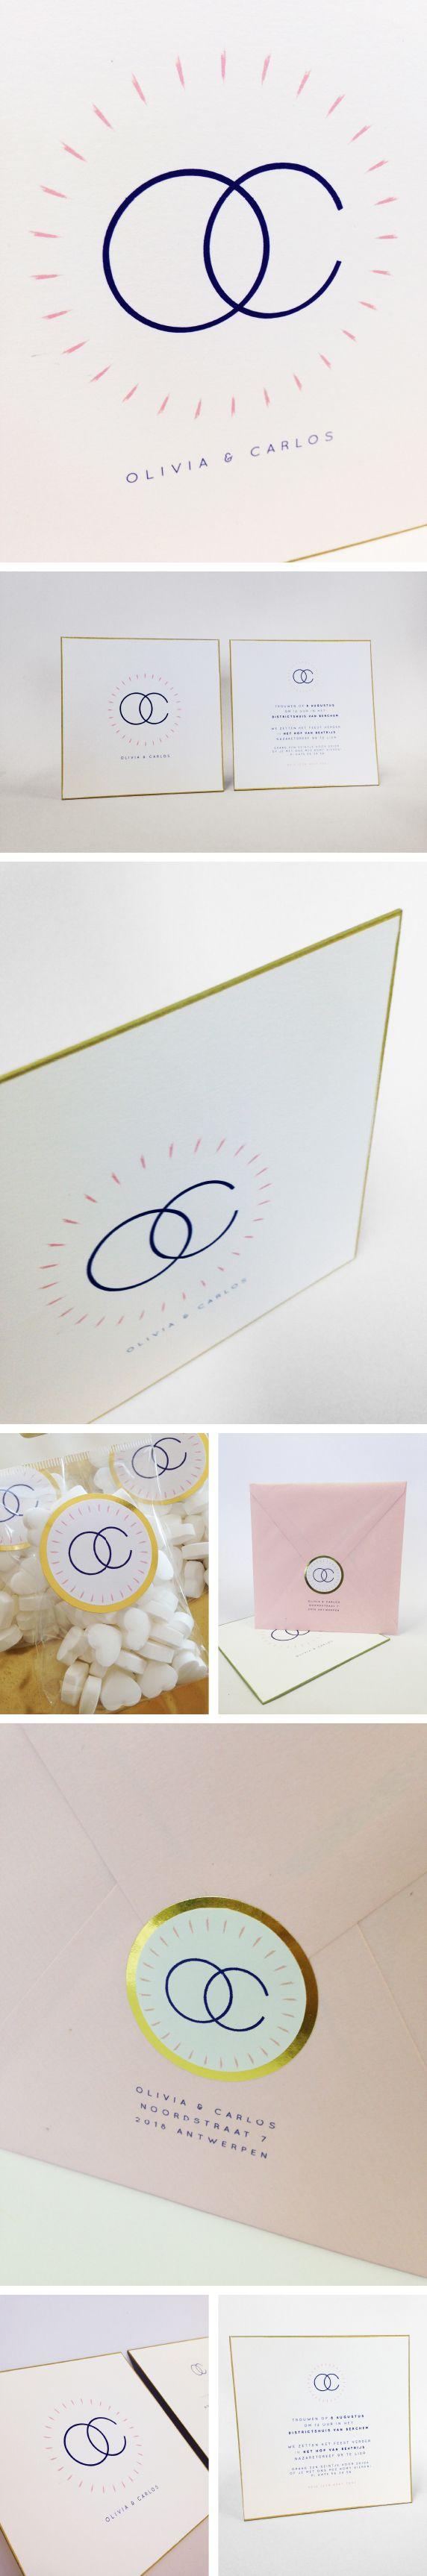 Olivia en Carlos, goud, roos, eenvoud, ringen, logo letters, trouwuitnodiging, mosstudio, ring, love, wedding invitation